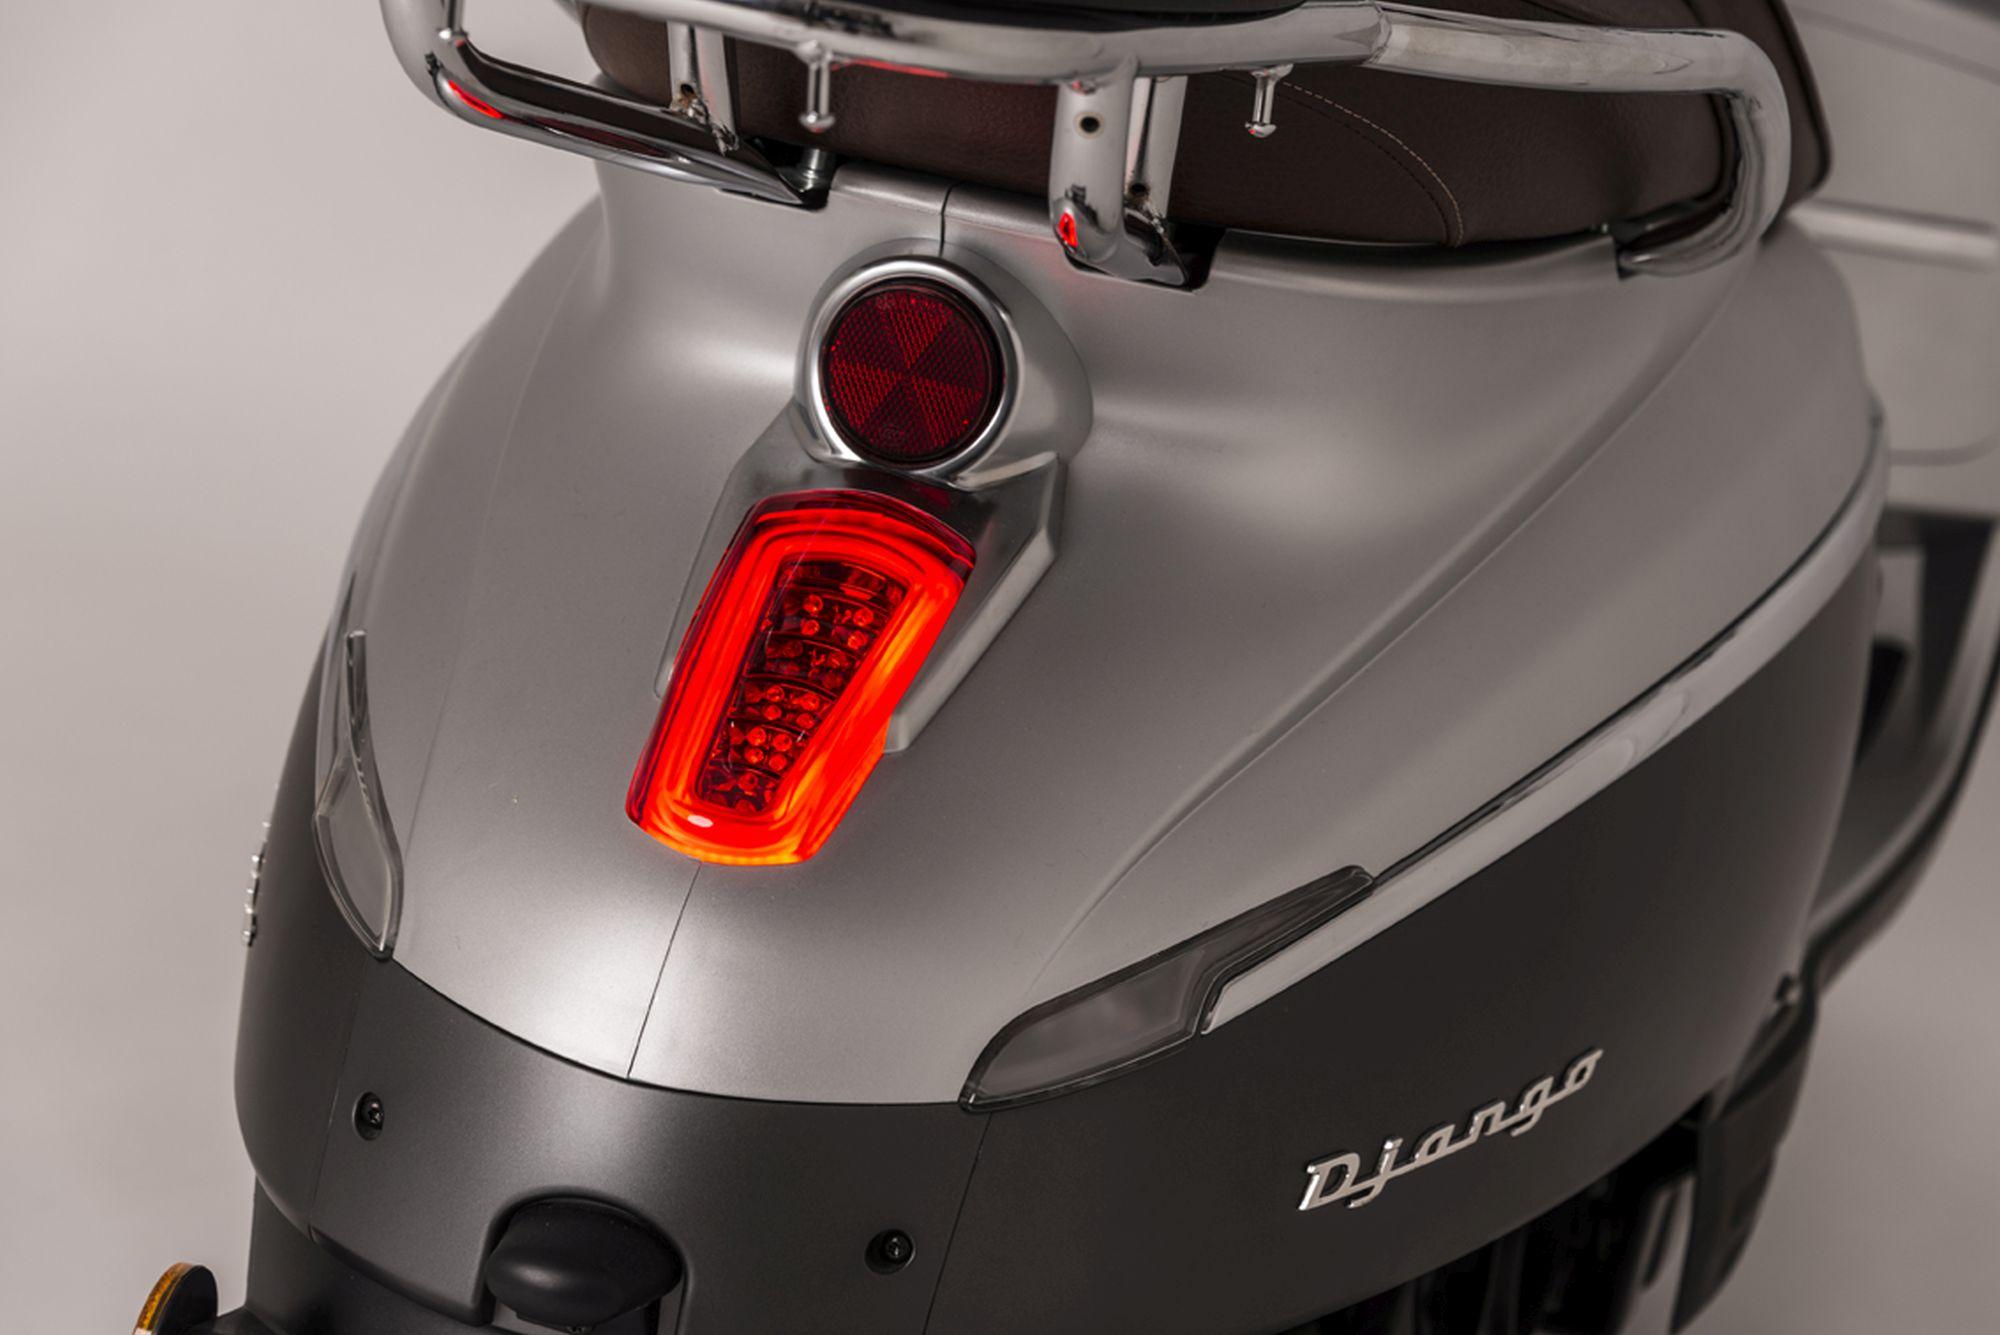 2016 Peugeot Django 50 Specs Images And Pricing